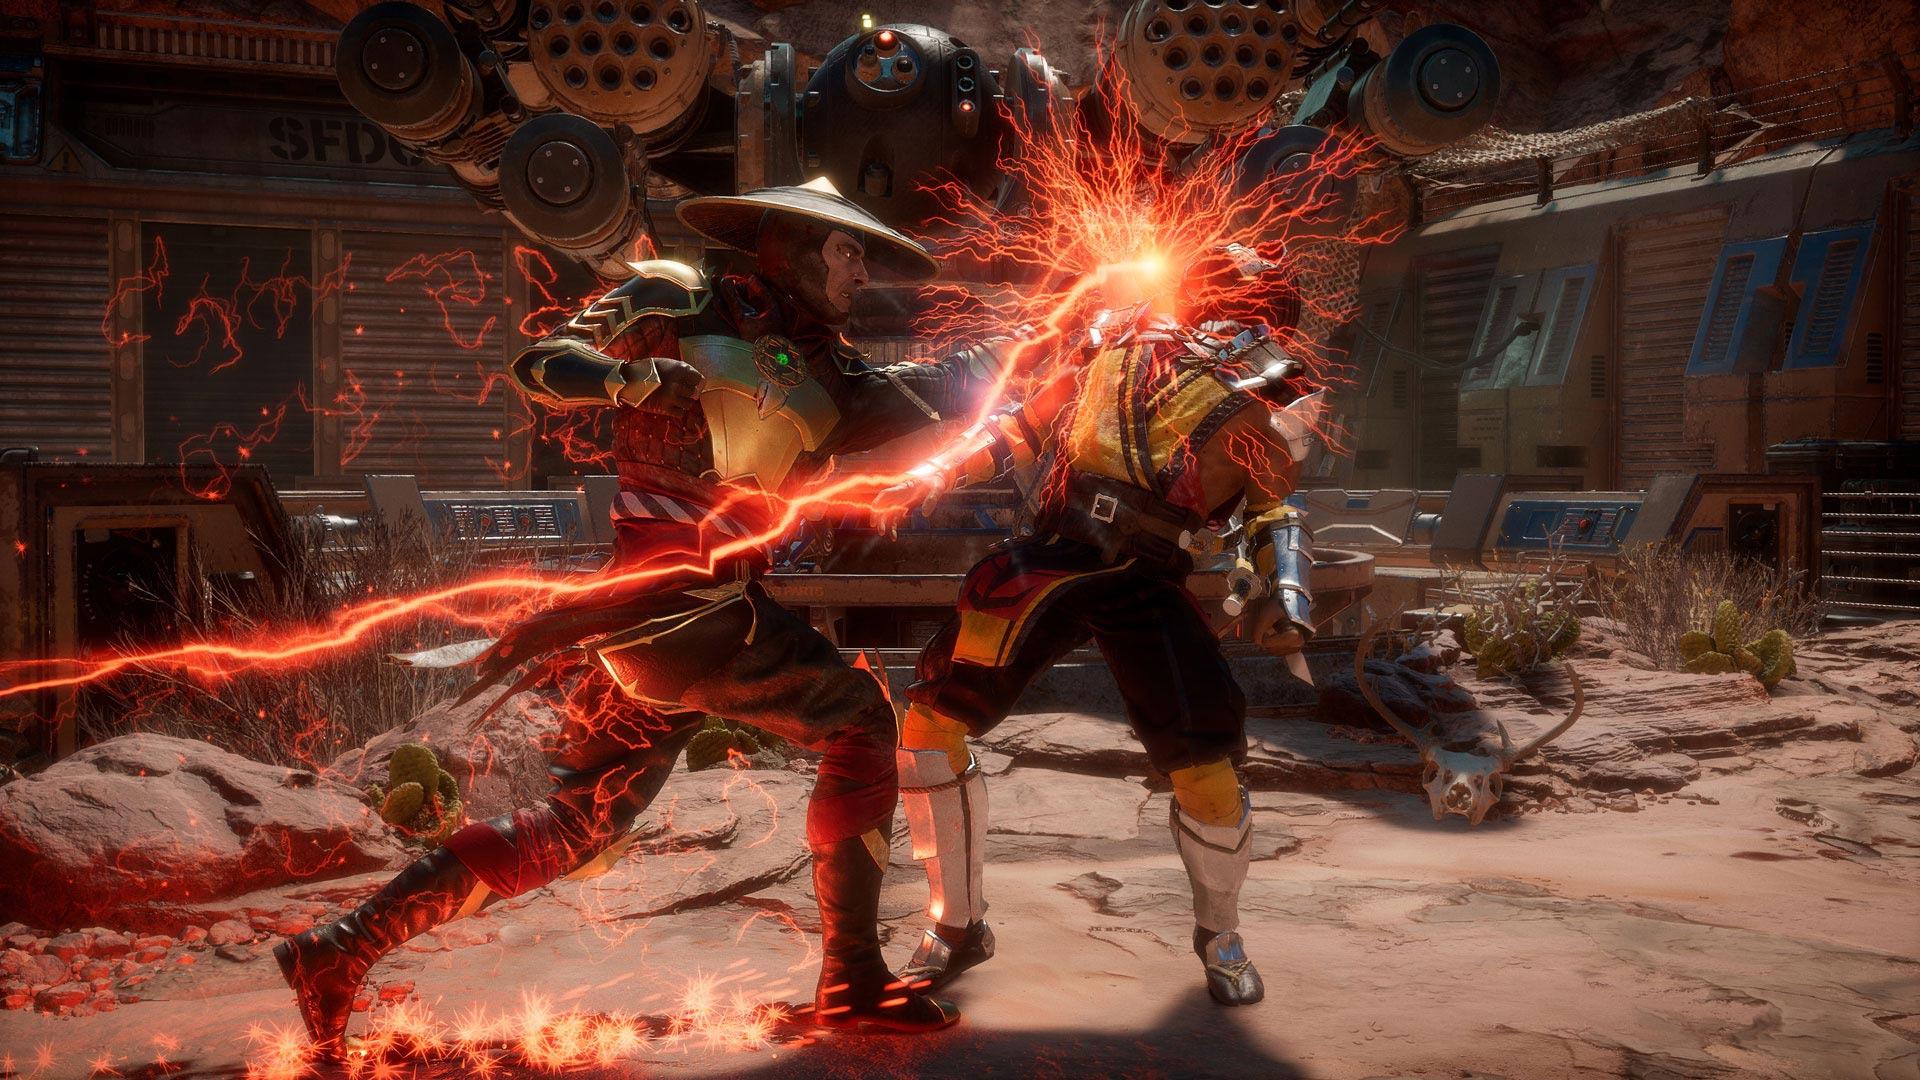 Oh hell yeah, Mortal Kombat 11 is all set for April screenshot